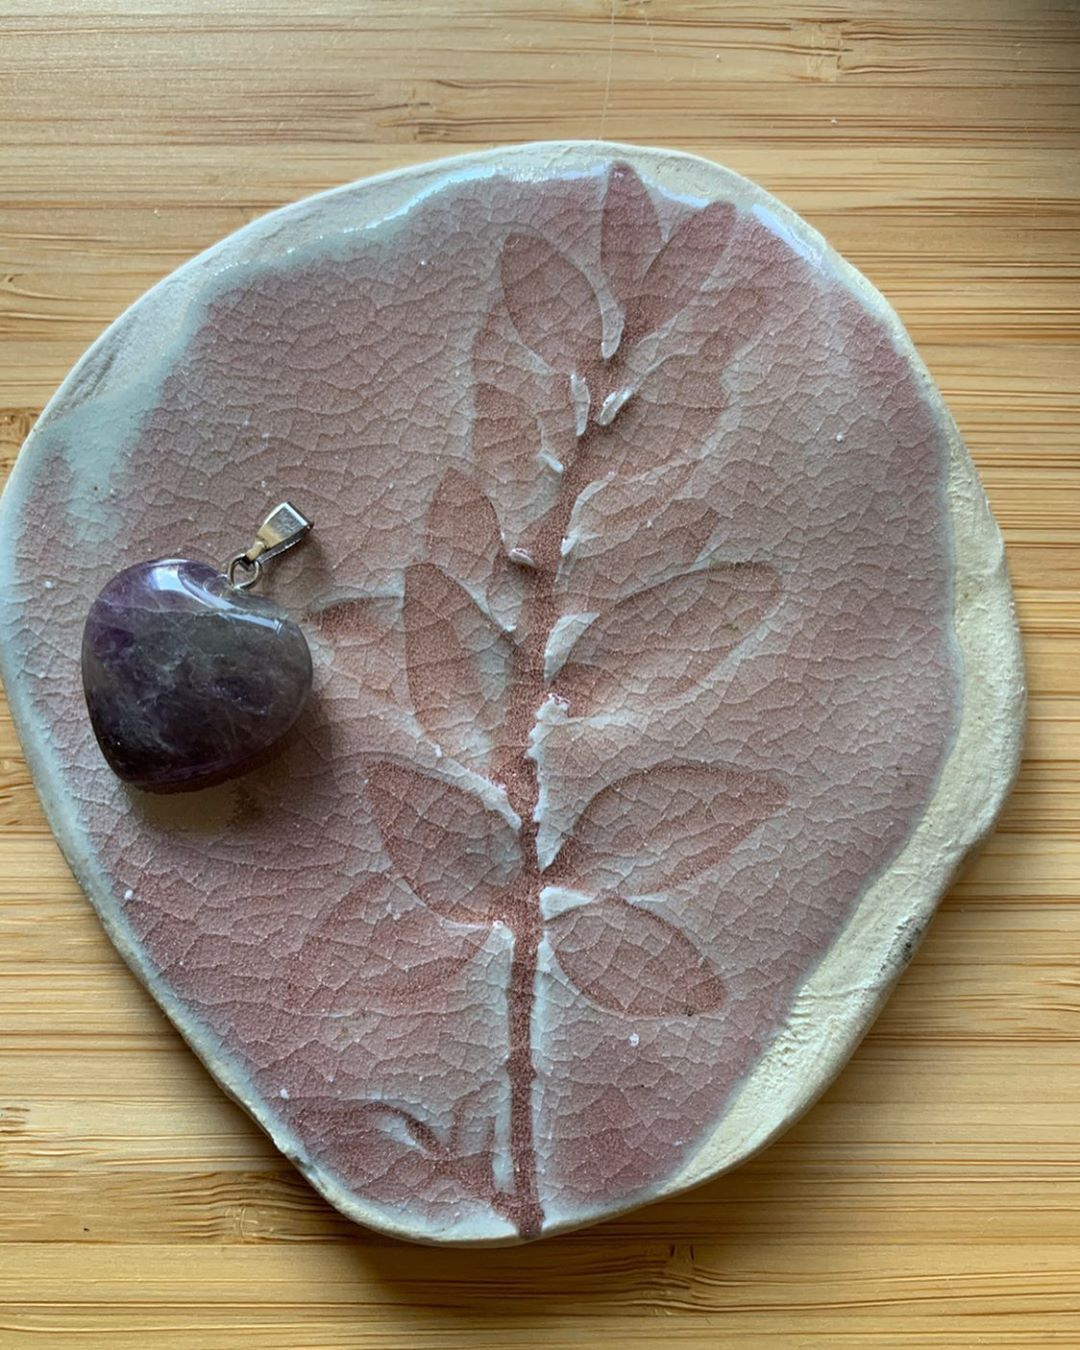 Amethyst 💜powerful, protective, healing, cleansing, intuitive , memory, creativity,motivational, meditative #amethyst ceramics #clay #pottery #earthenware#handmade #instapottery#ilovepottery #glaze#madebyme#craft#potteryofinstagram #seekcreateinspire#australianceramics#handmade#simplicity #wheelthrownpottery #australianpotter#wabisabi#makersgonnamake #ceramics #clay #pottery #earthenware#handmade #instapottery#ilovepottery #glaze#madebyme#craft#potteryofinstagram #seekcreateinspire#bohostyle #a